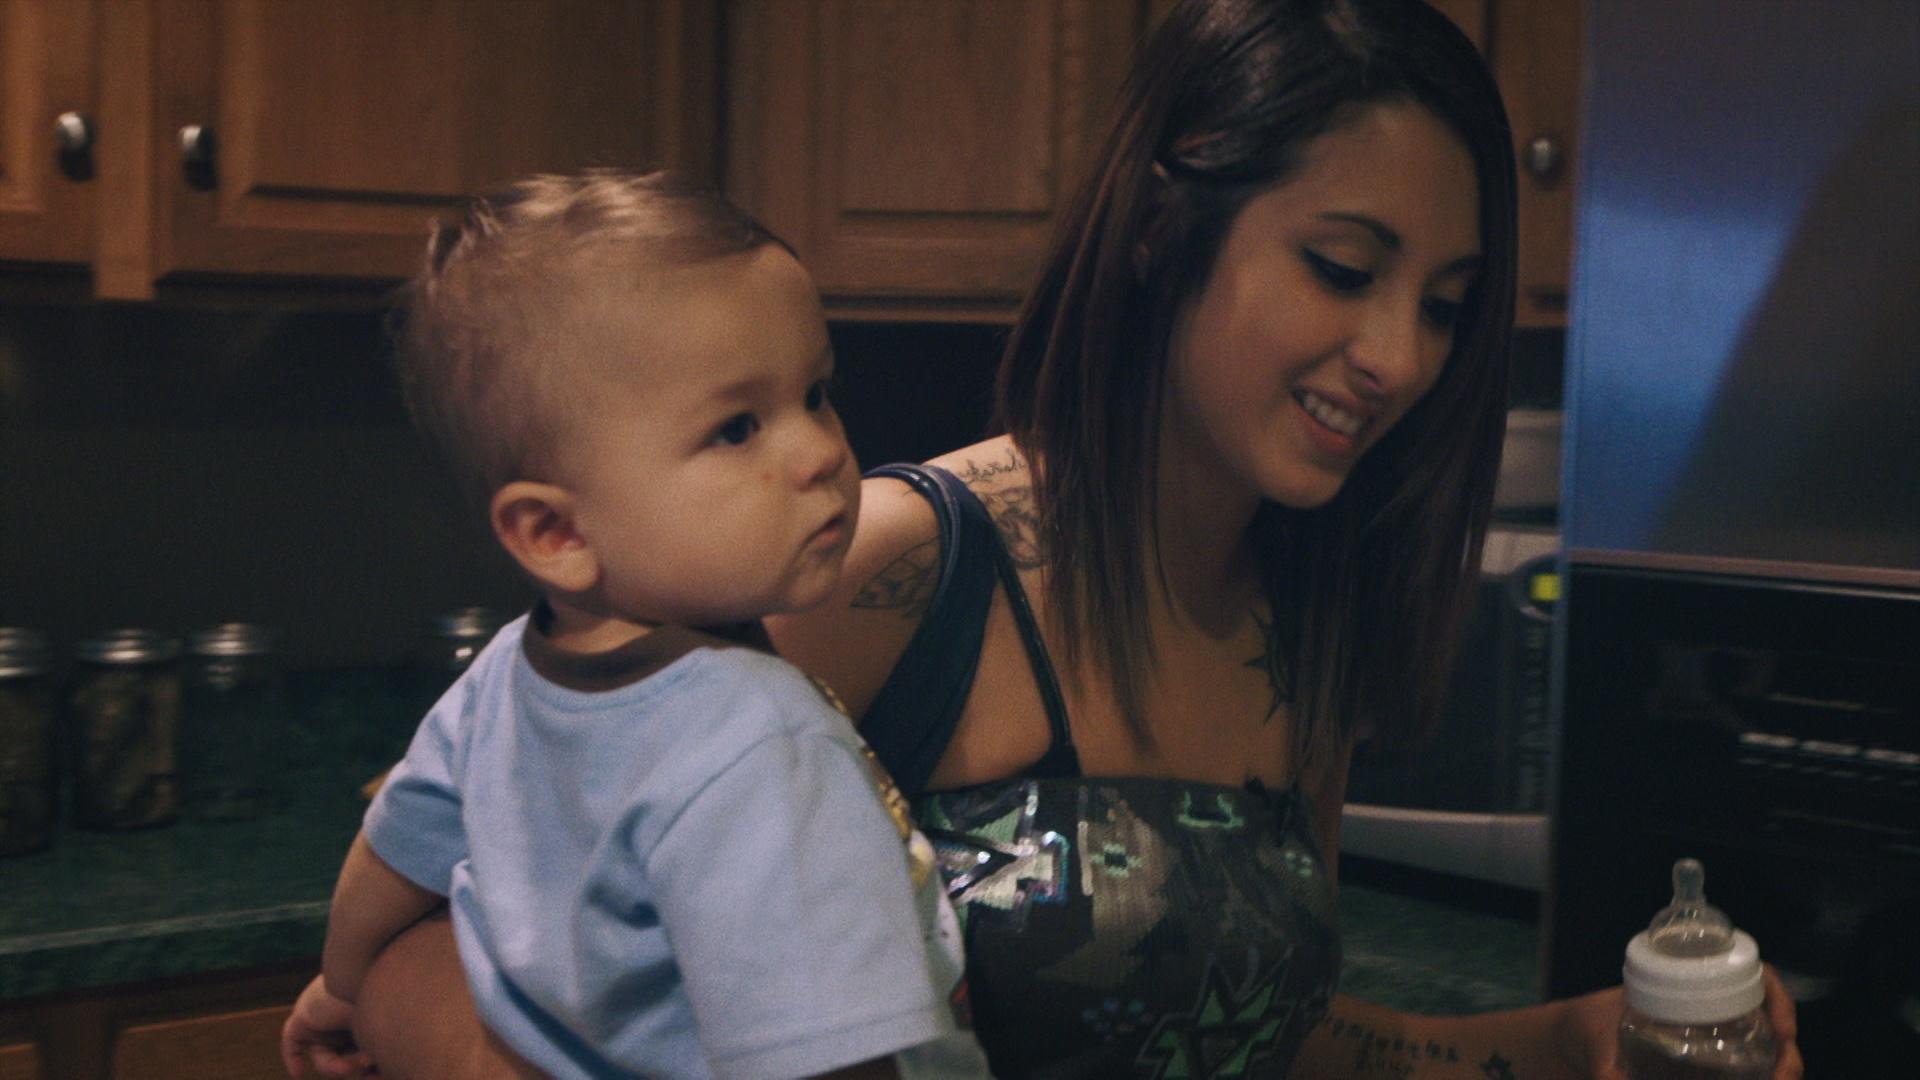 Minding the Gap - Parenting, Clip 3